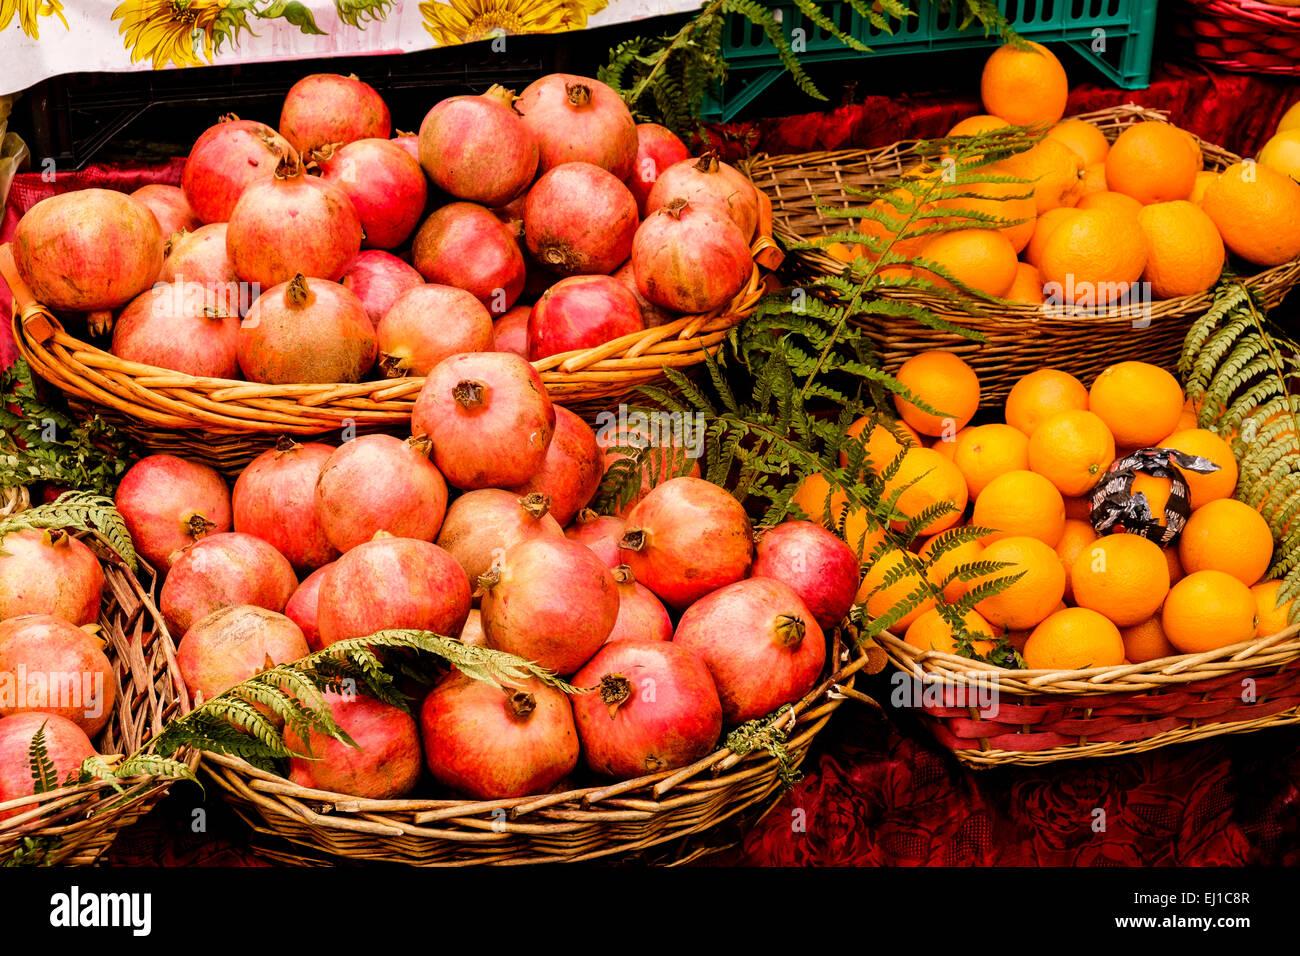 Pomegranates and oranges on sale at Campo de Fiori market  in Rome Italy - Stock Image